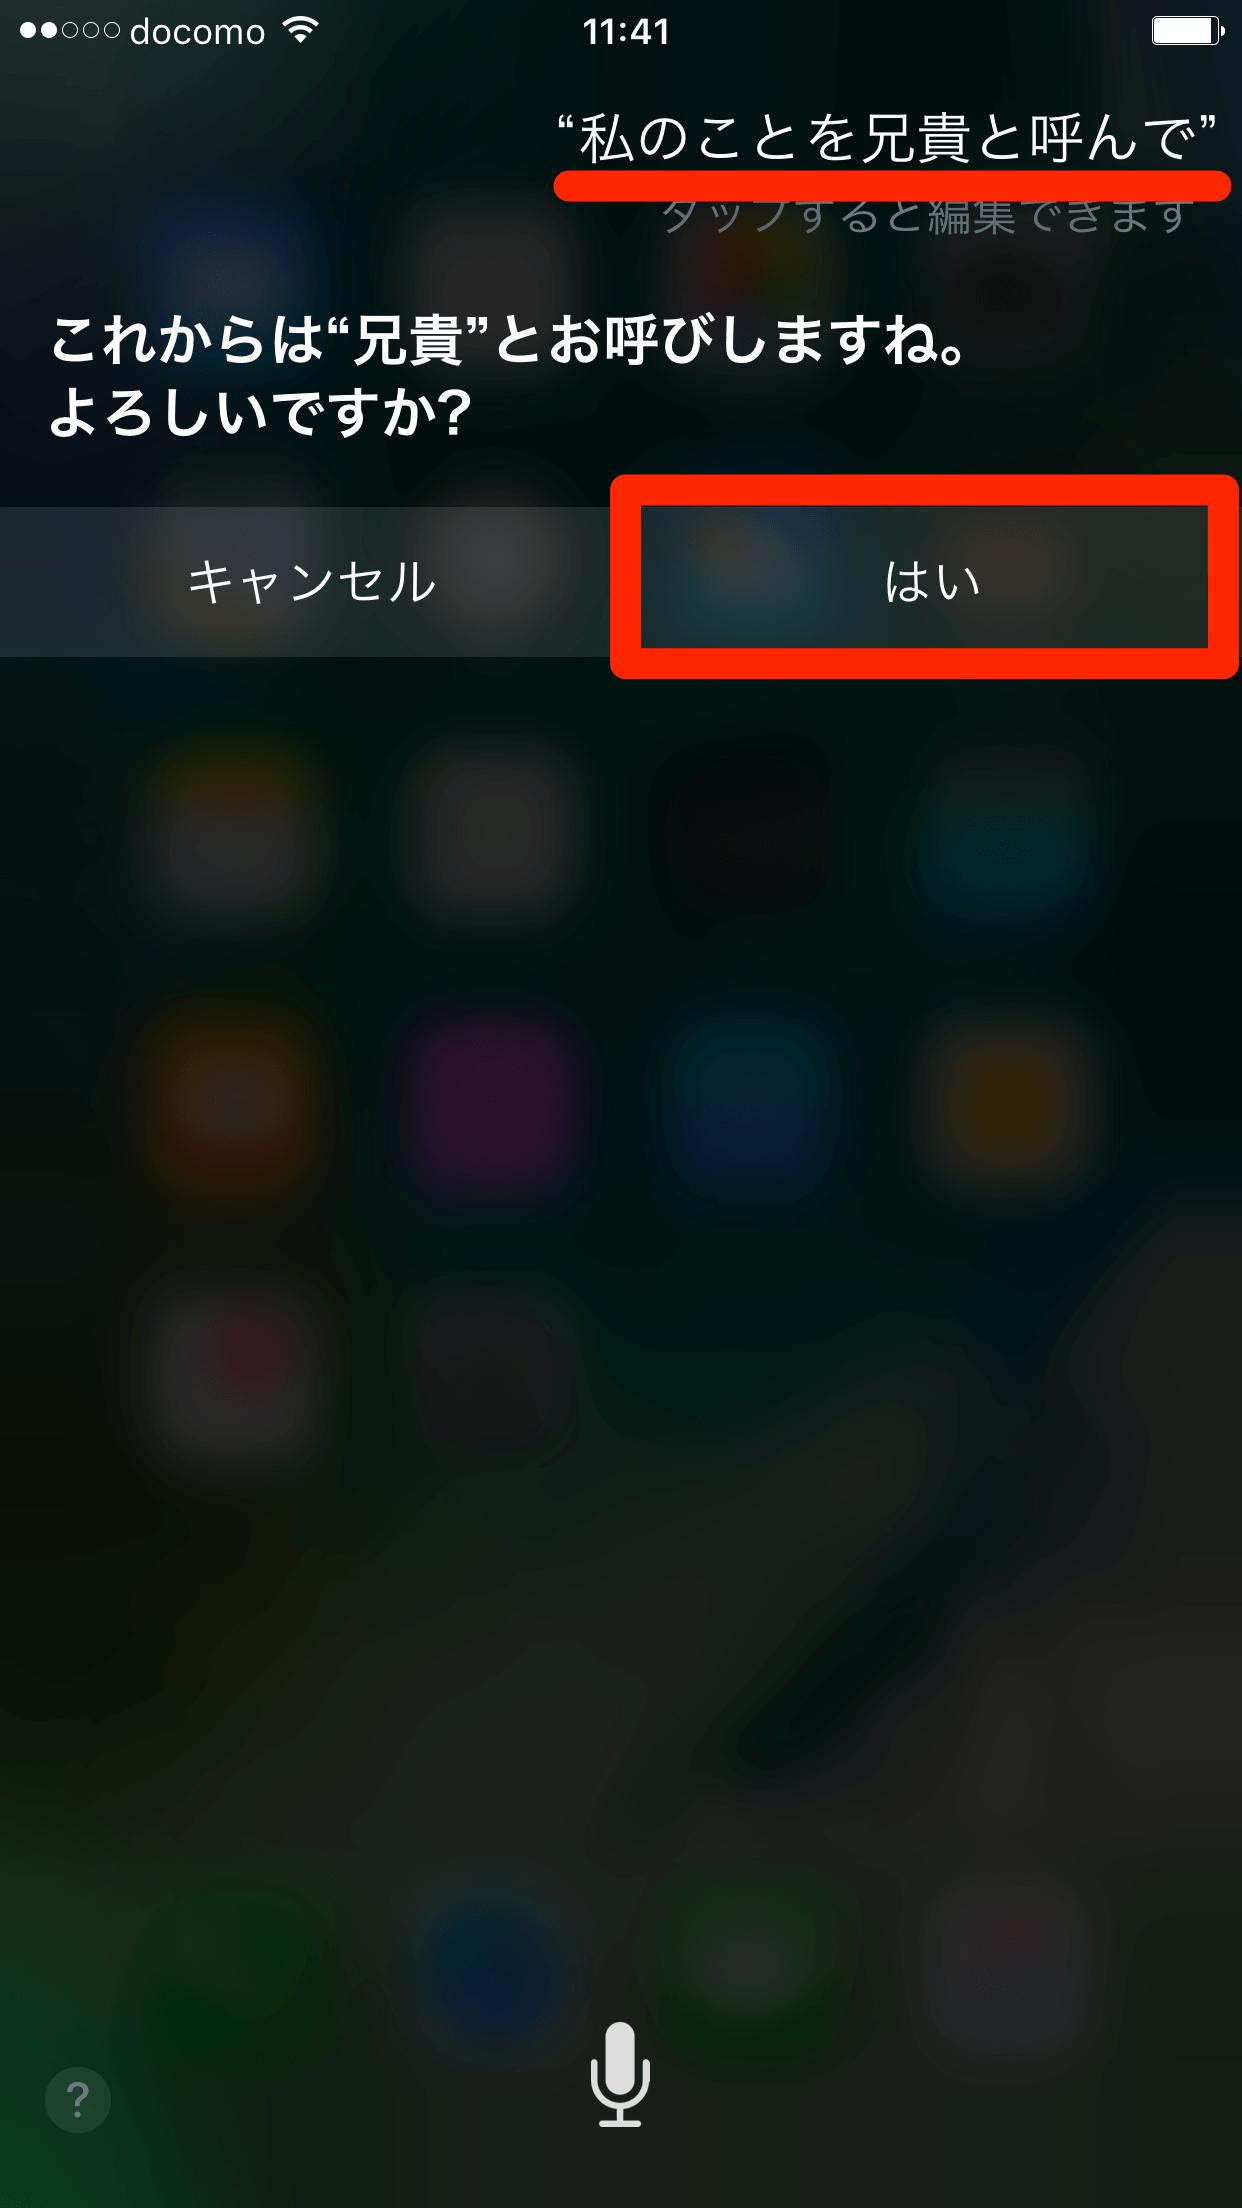 Siriにニックネームを覚えてもらう方法